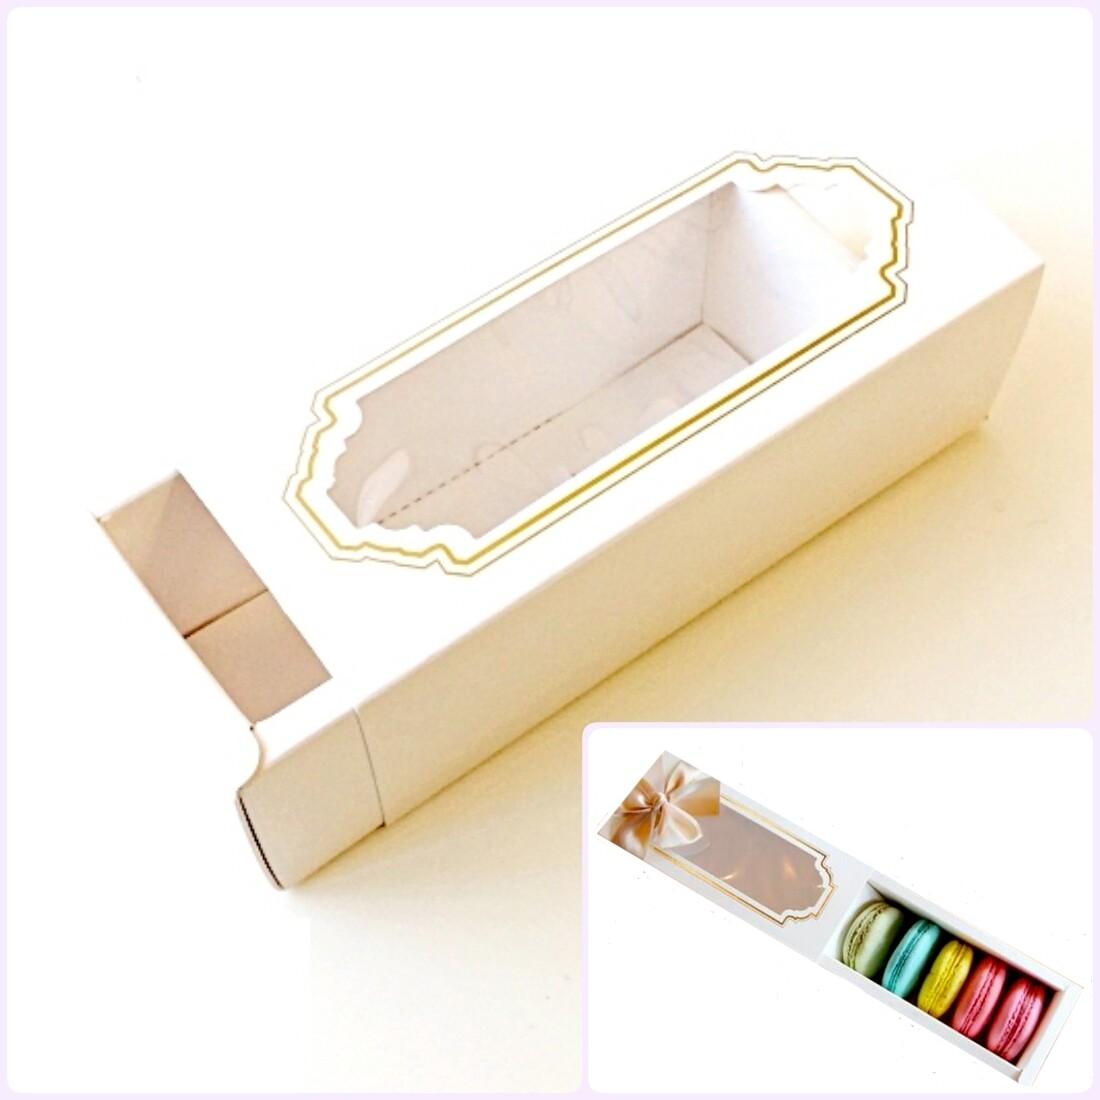 Коробка-пенал для макарони 14*5*5 см | упак. 10 шт